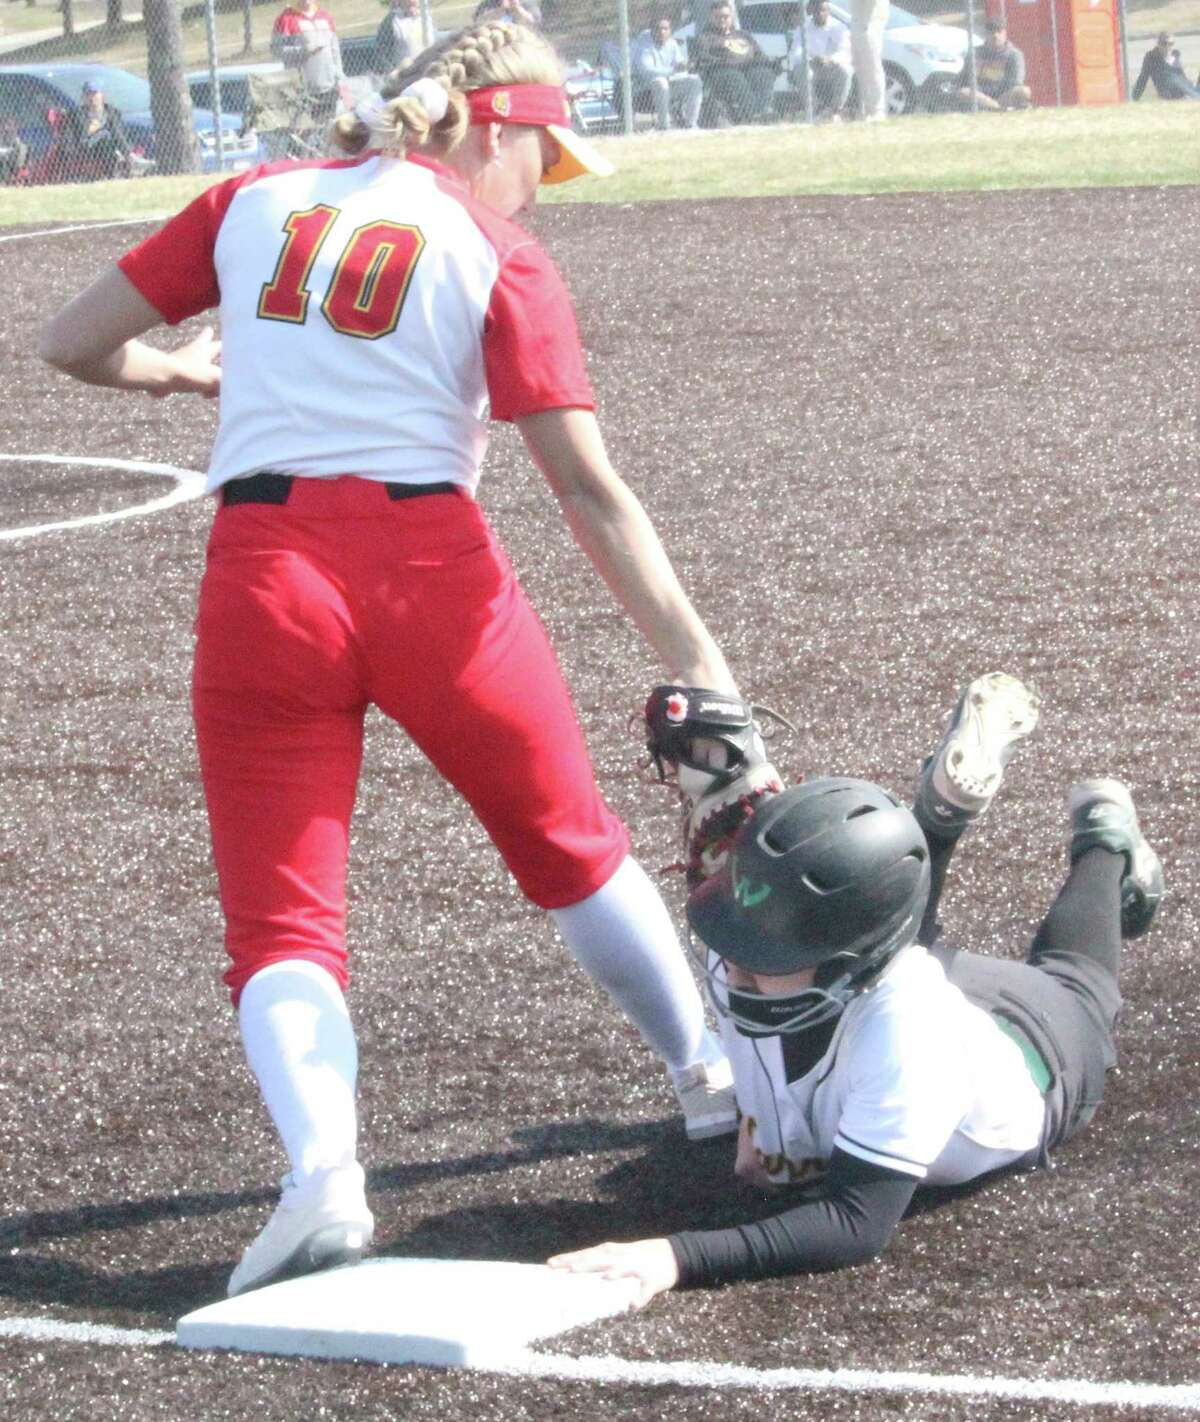 Ferris first baseman Kaitlyn Orme tags outa Wayne Staterunner in recent GLIAC action. (Pioneer photo/John Raffel)